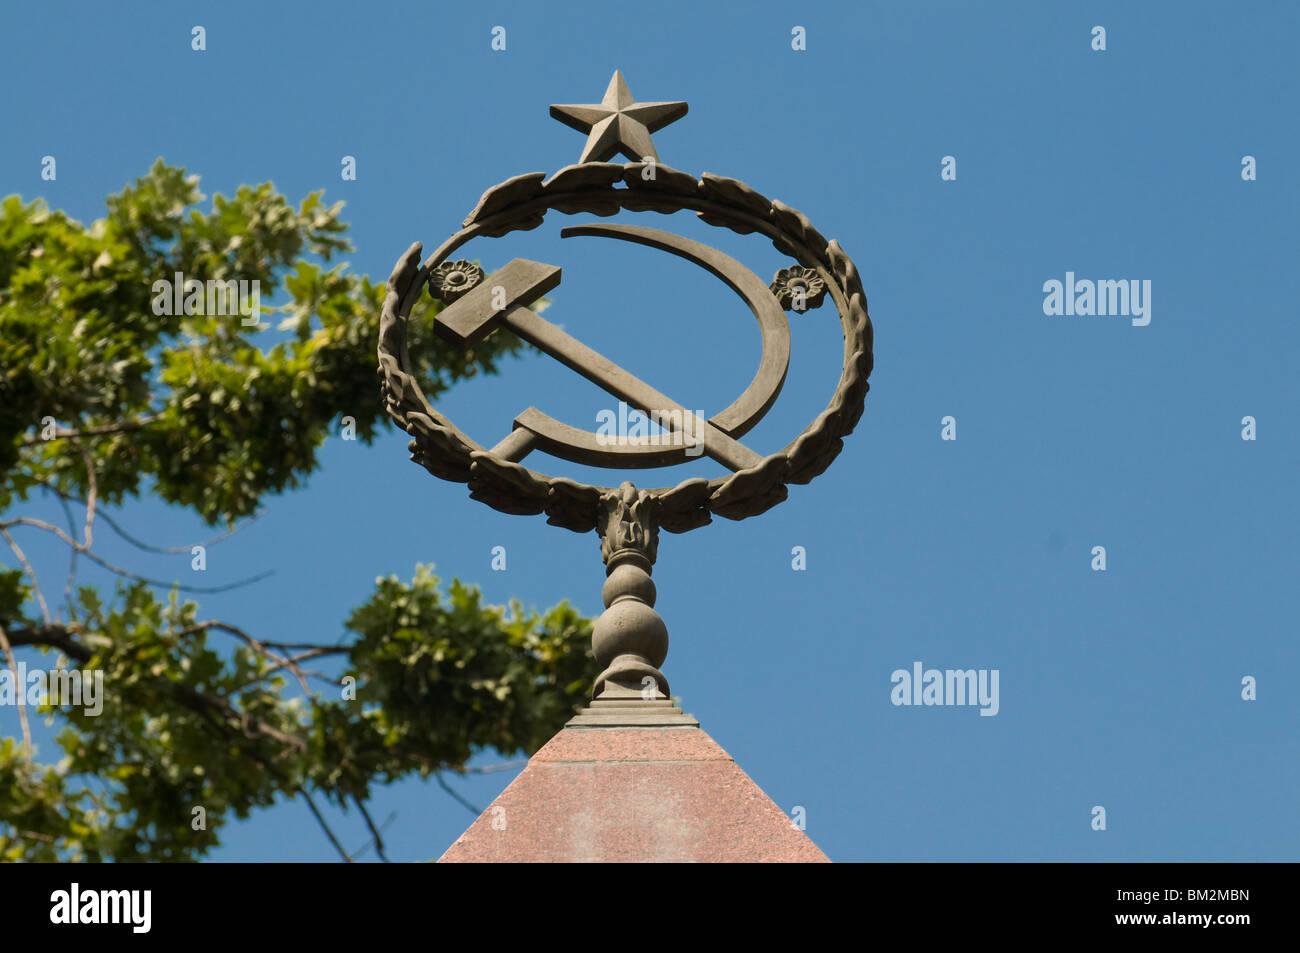 Hammer and sickle as sign of communism, Bishkek, Kyrgyzstan - Stock Image